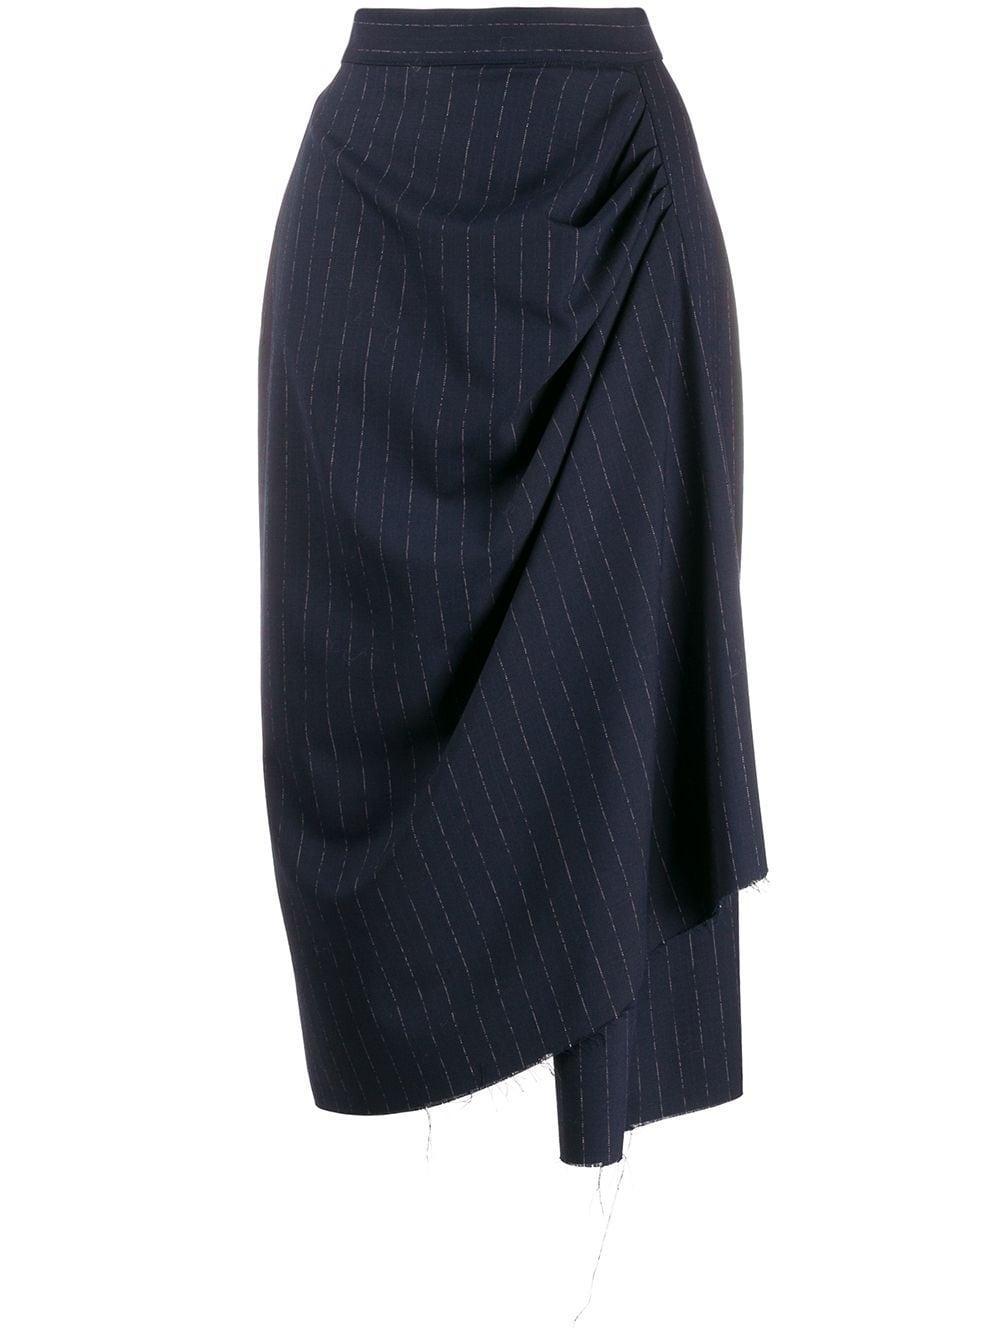 Act N°1 юбка-карандаш асимметричного кроя в полоску